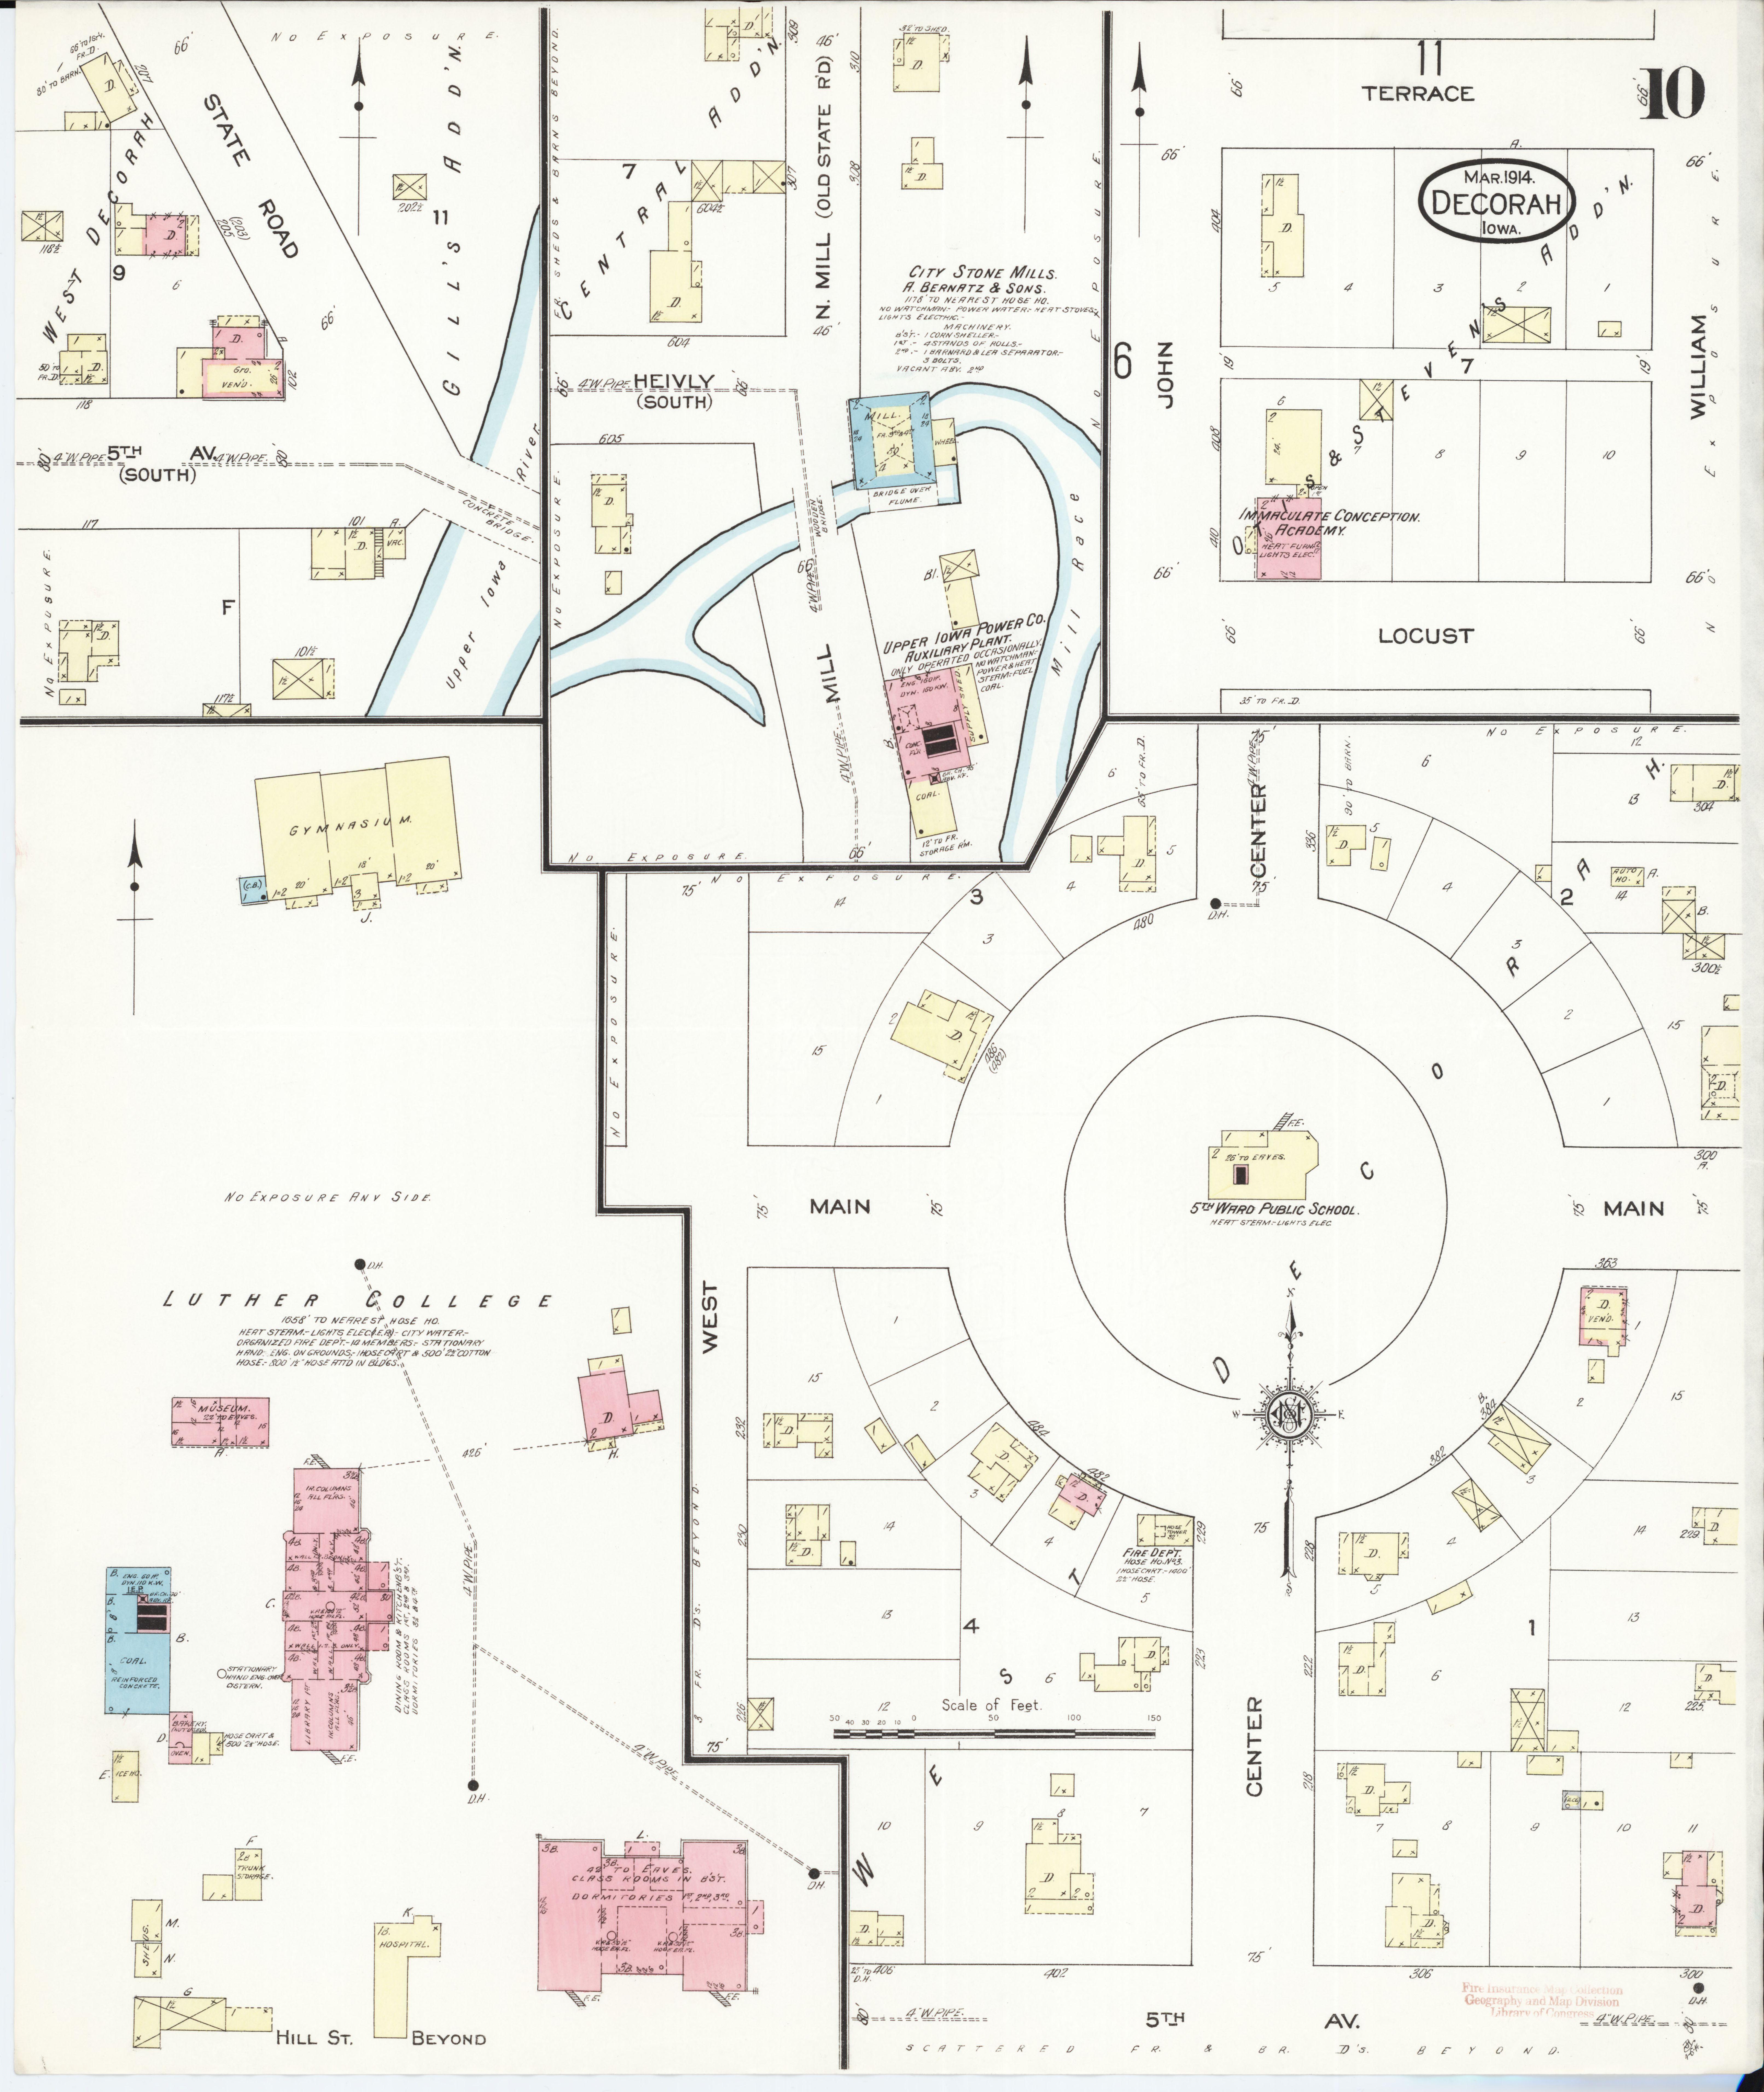 File Sanborn Fire Insurance Map From Decorah Winneshiek County